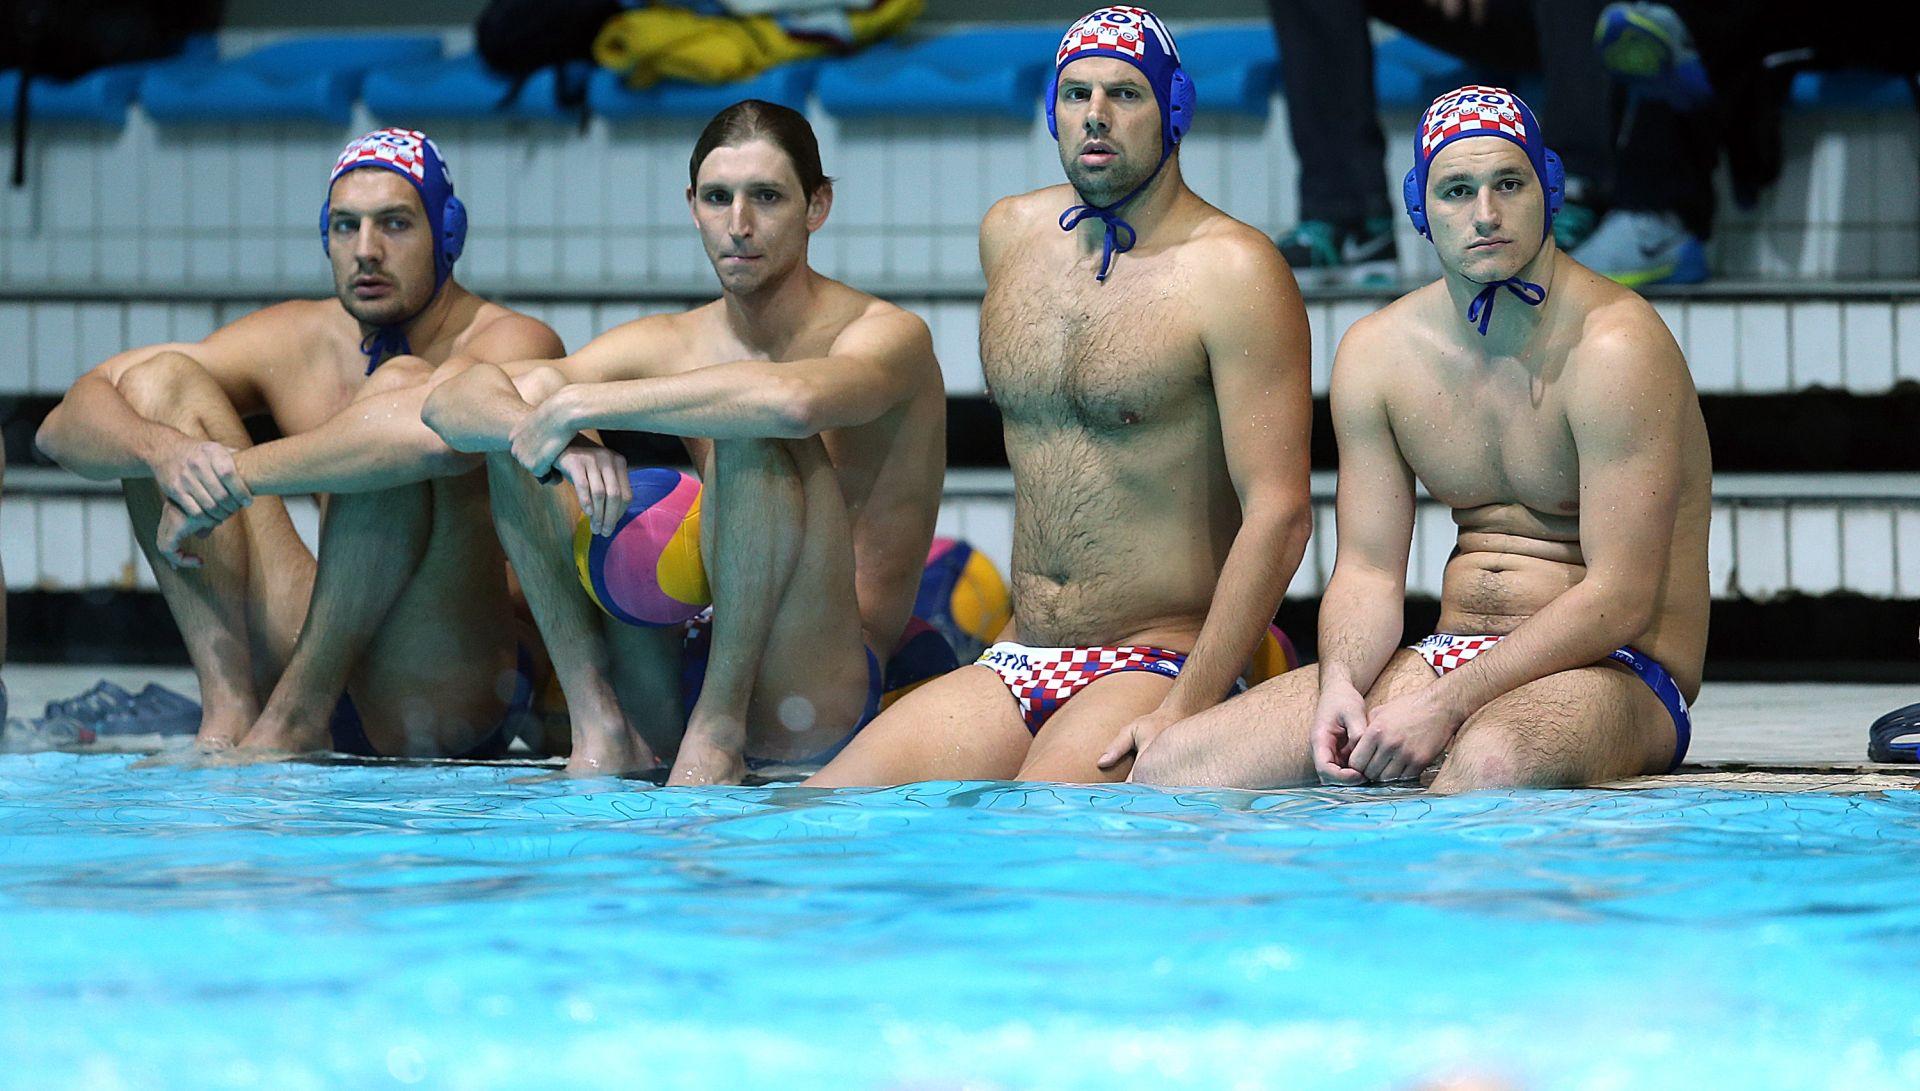 OI RIO Raspored subotnjih nastupa hrvatskih sportaša